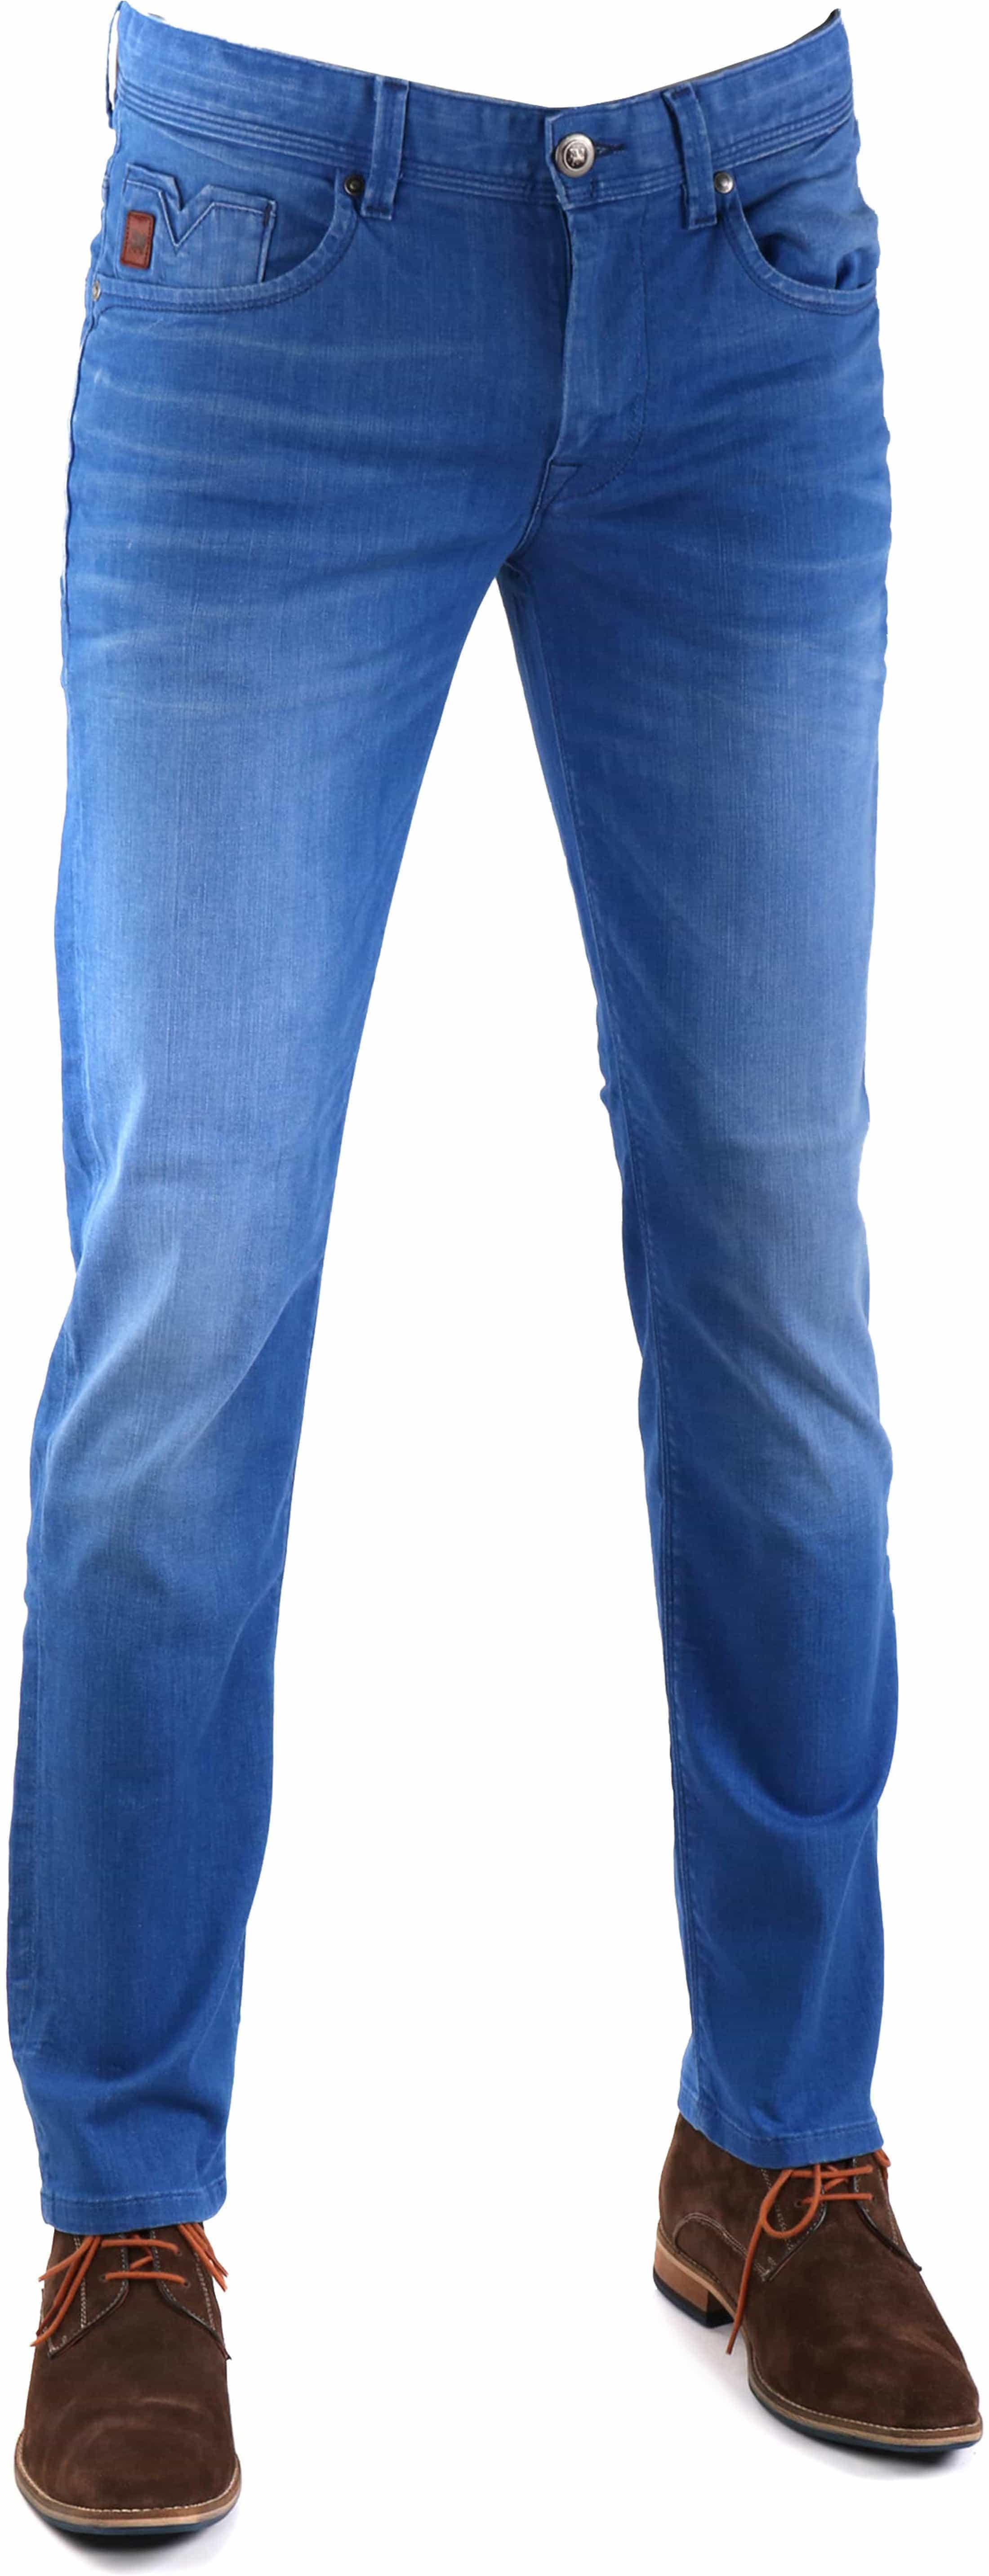 Vanguard V7 Rider Jeans Blue foto 0